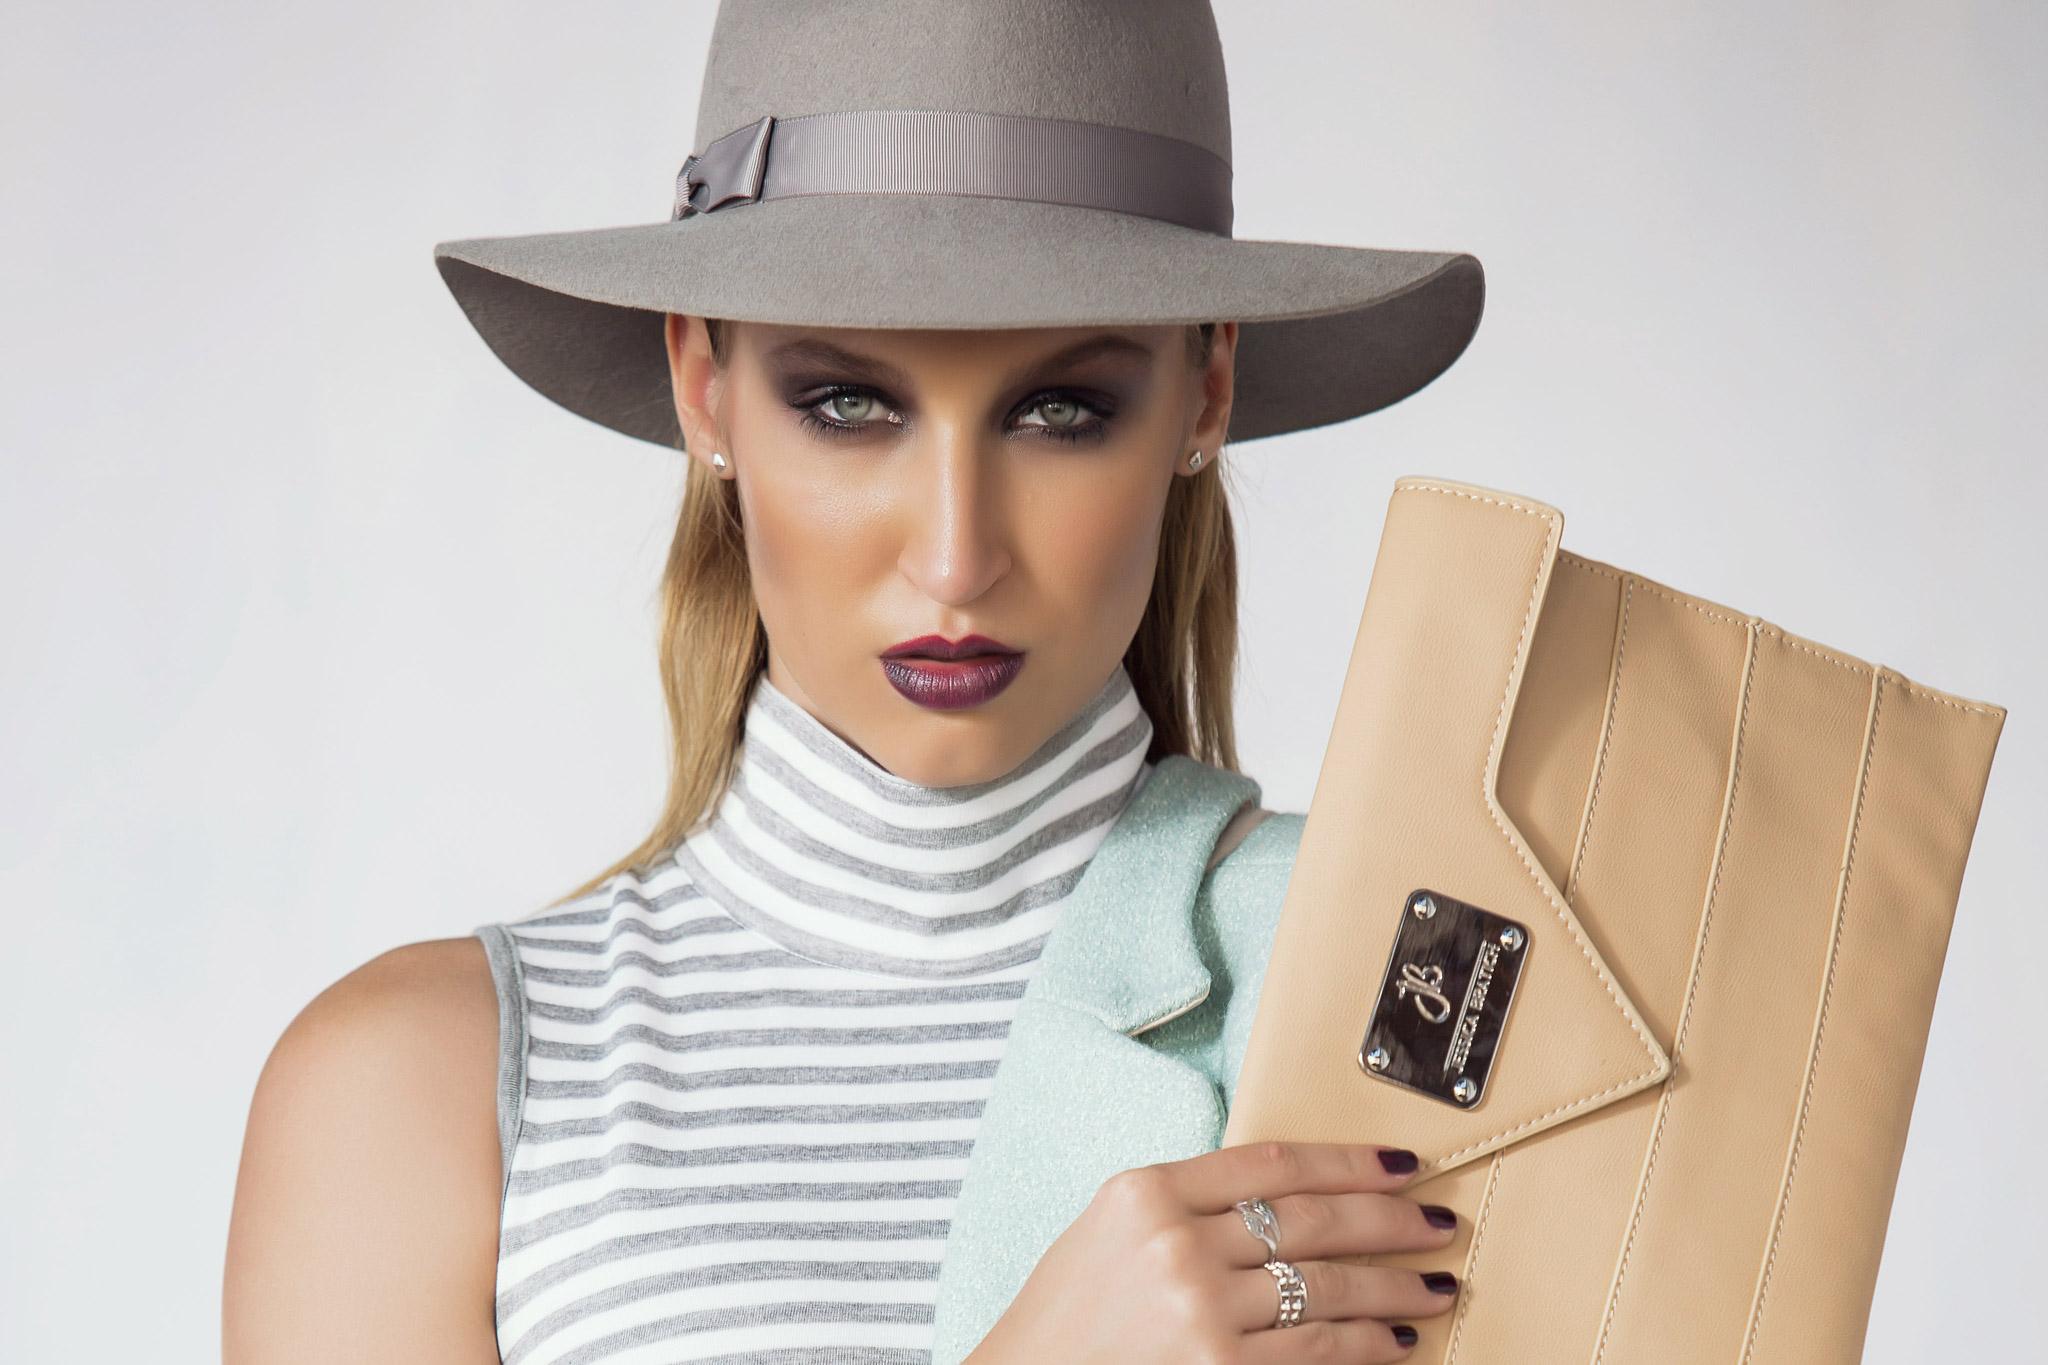 JESS BRATICH A/W15  Designer: Jess Bratich // Stylist: Elle Giles (Eat Fashion Not Cake) // Make-up: Simone Cohen (SC Artistry) // Hair: Denise Lacey // Model: Grady Wulff (Chadwick Models)